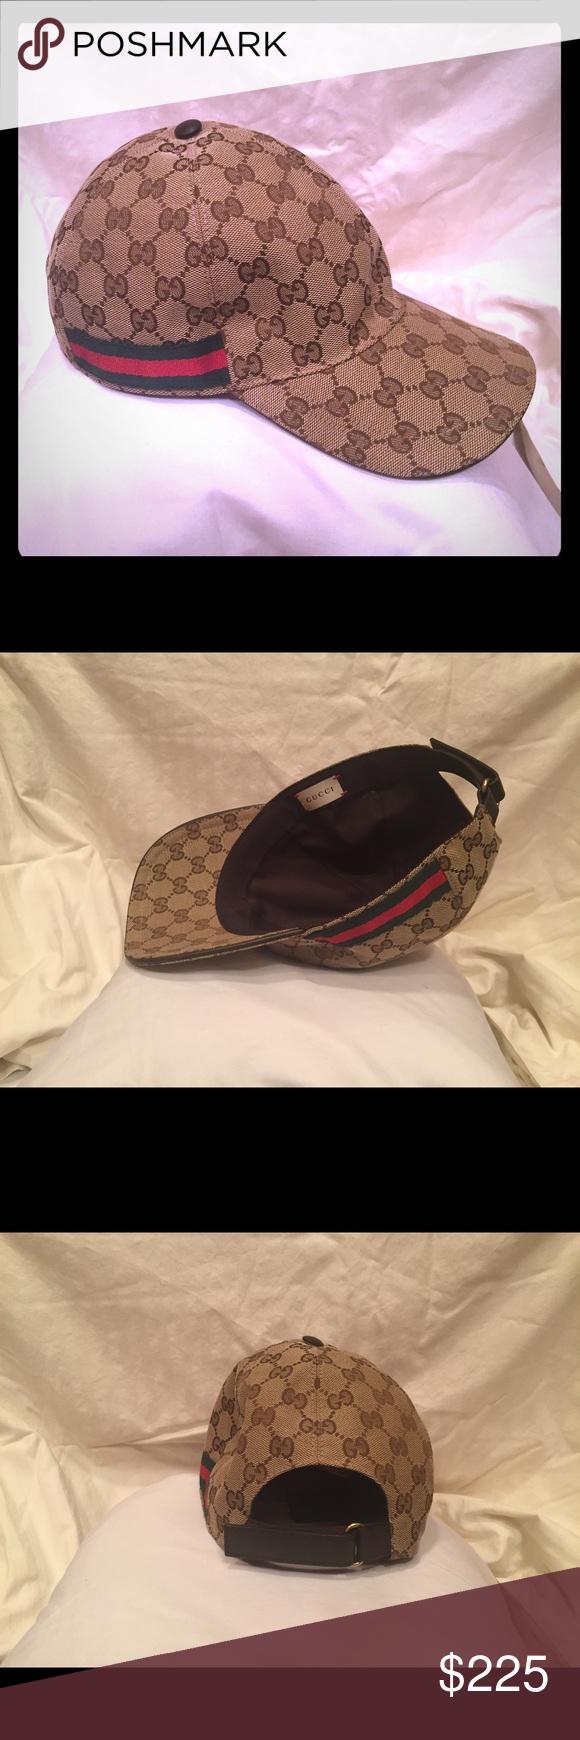 334e556dfef Original GG Canvas Baseball Cap with web Men s excellent condition like new Gucci  Accessories Hats